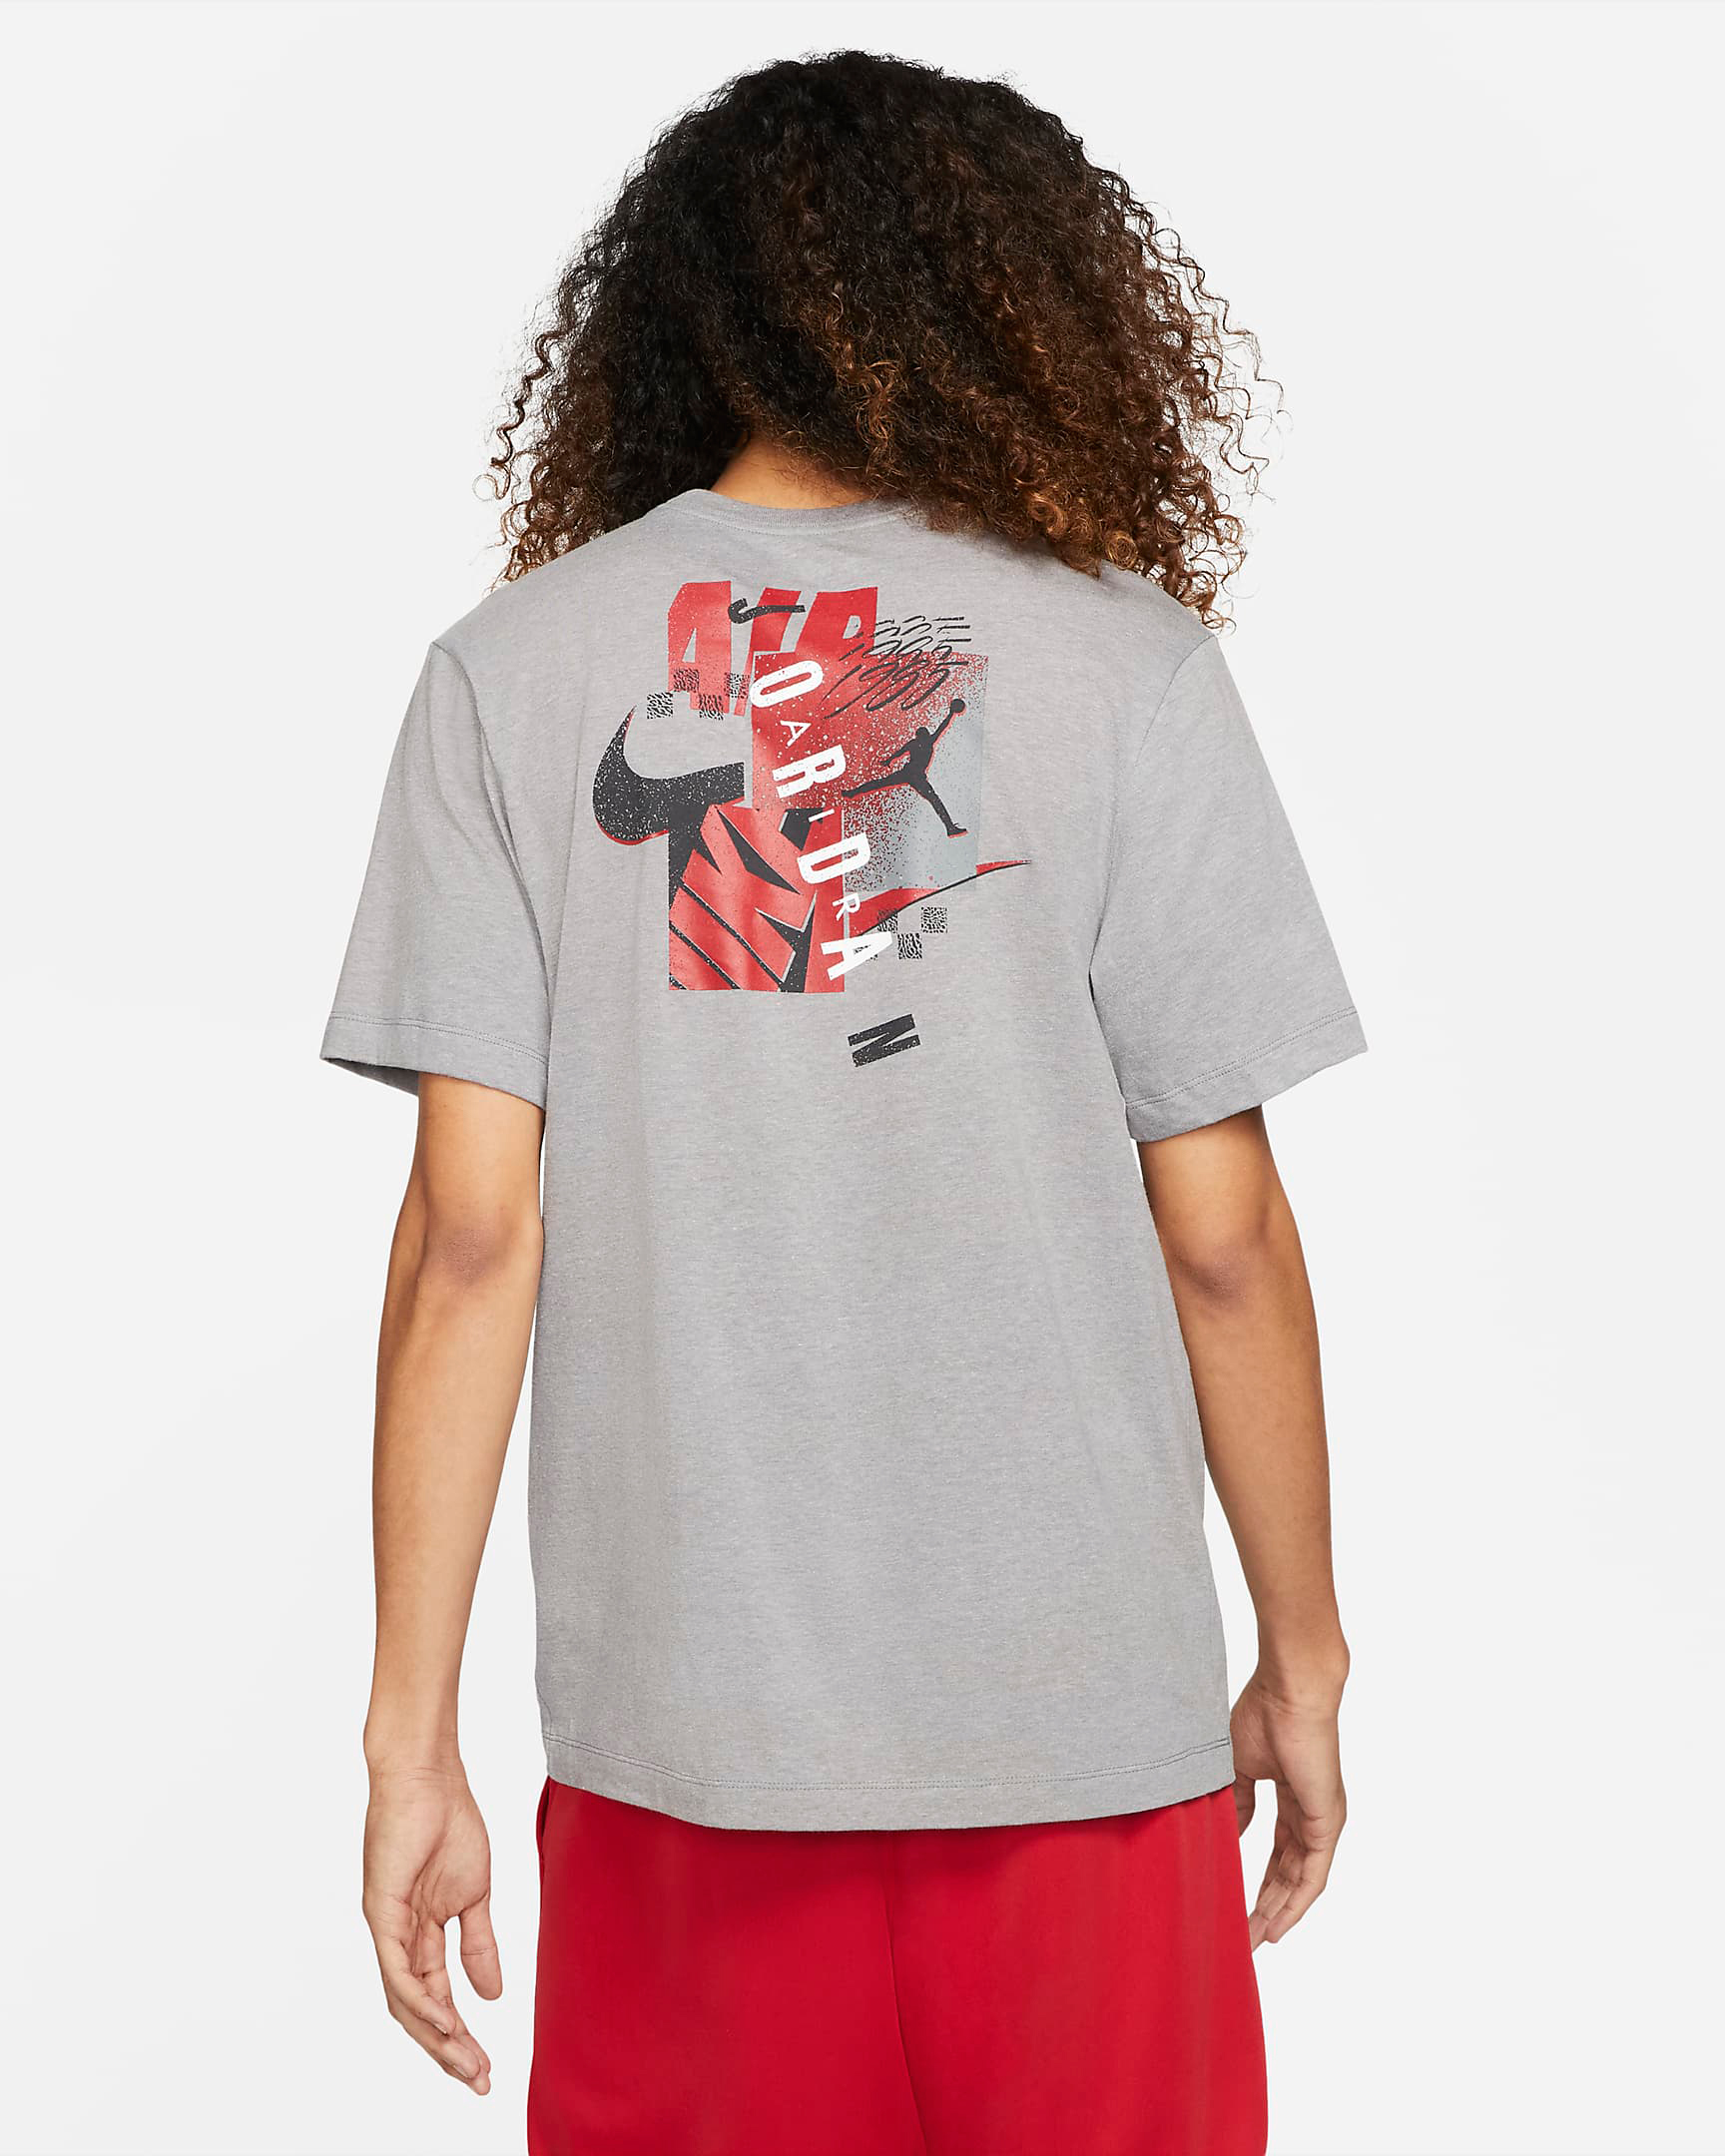 jordan-air-futura-shirt-grey-black-red-summer-2021-4